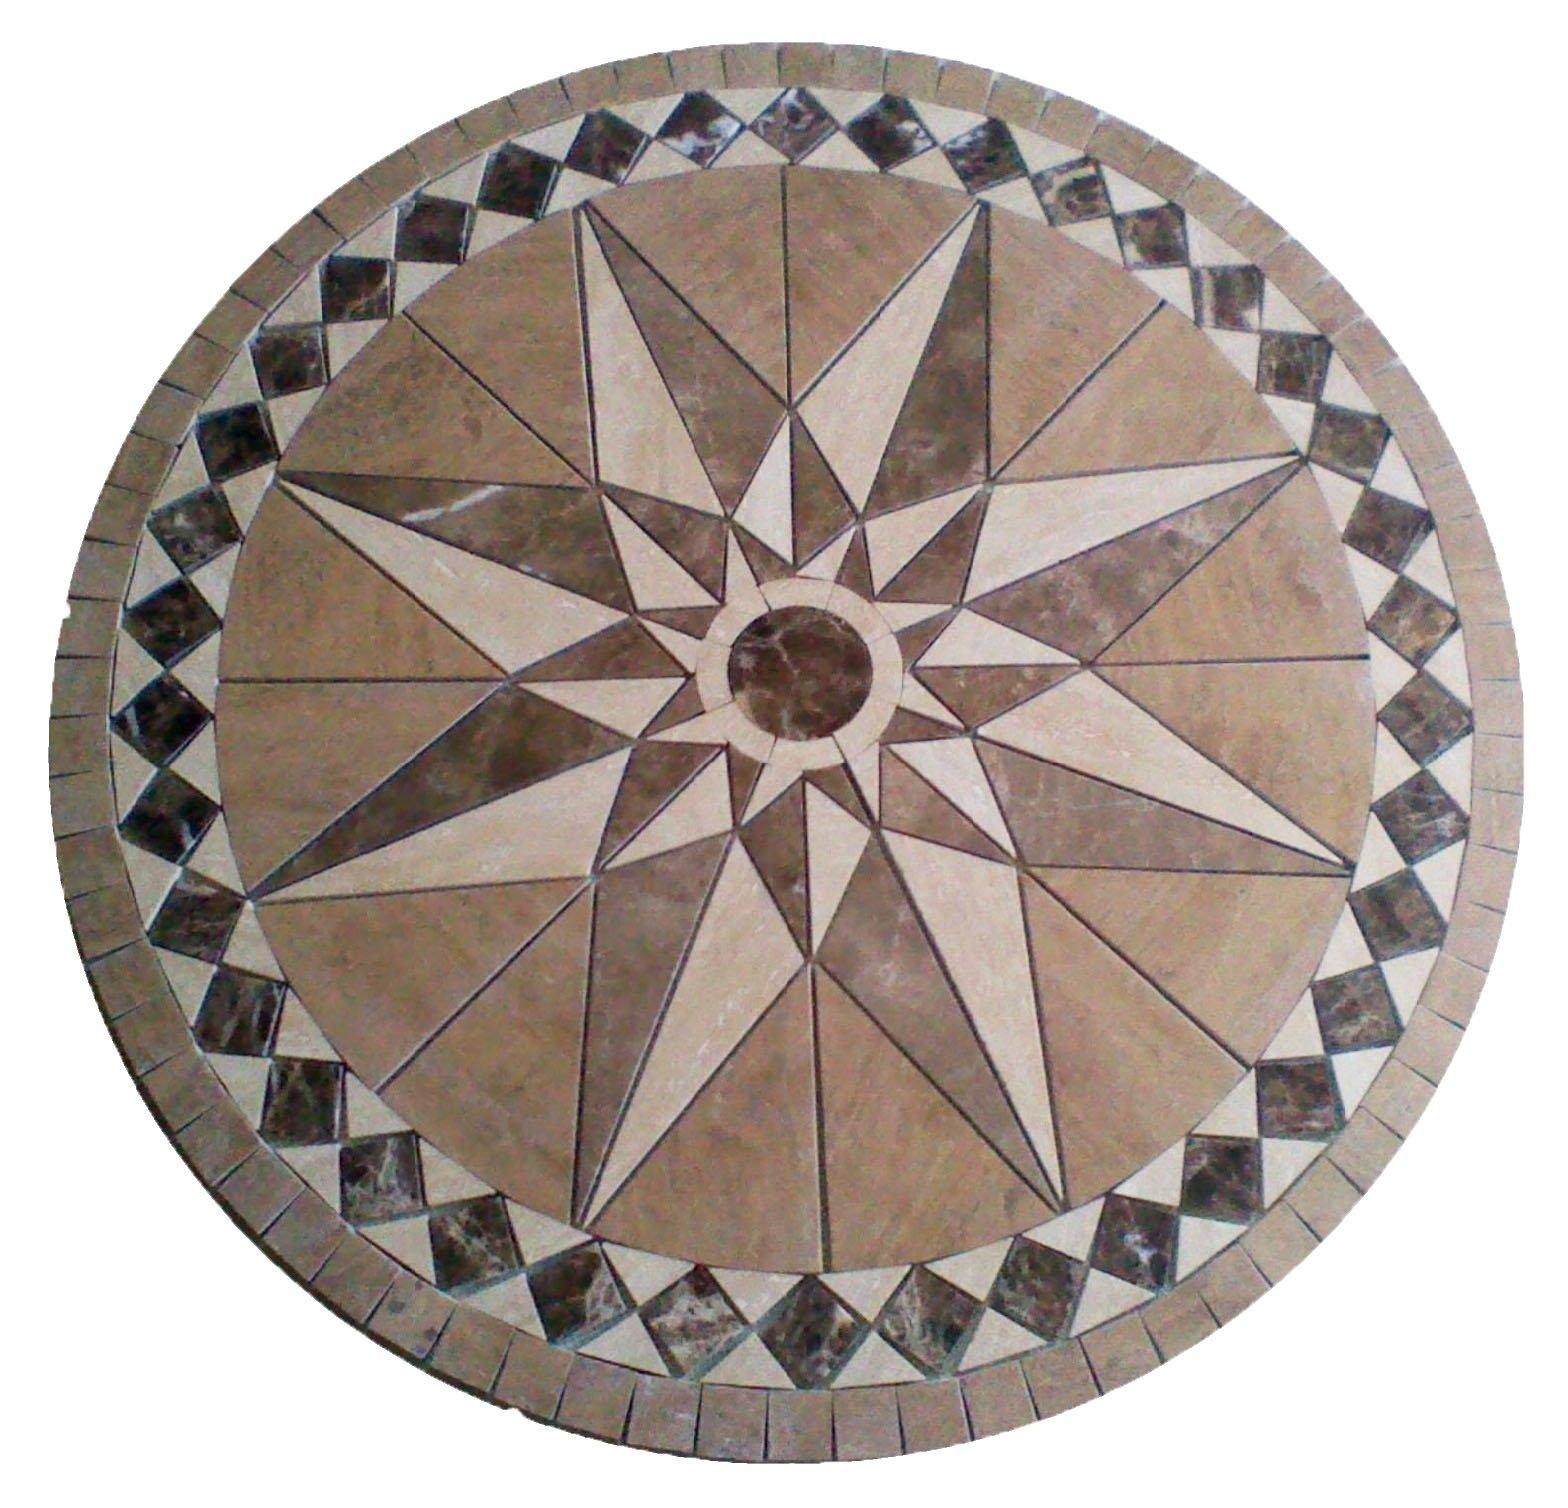 Tile Floor Medallion Marble Mosaic Travertine Star 36''